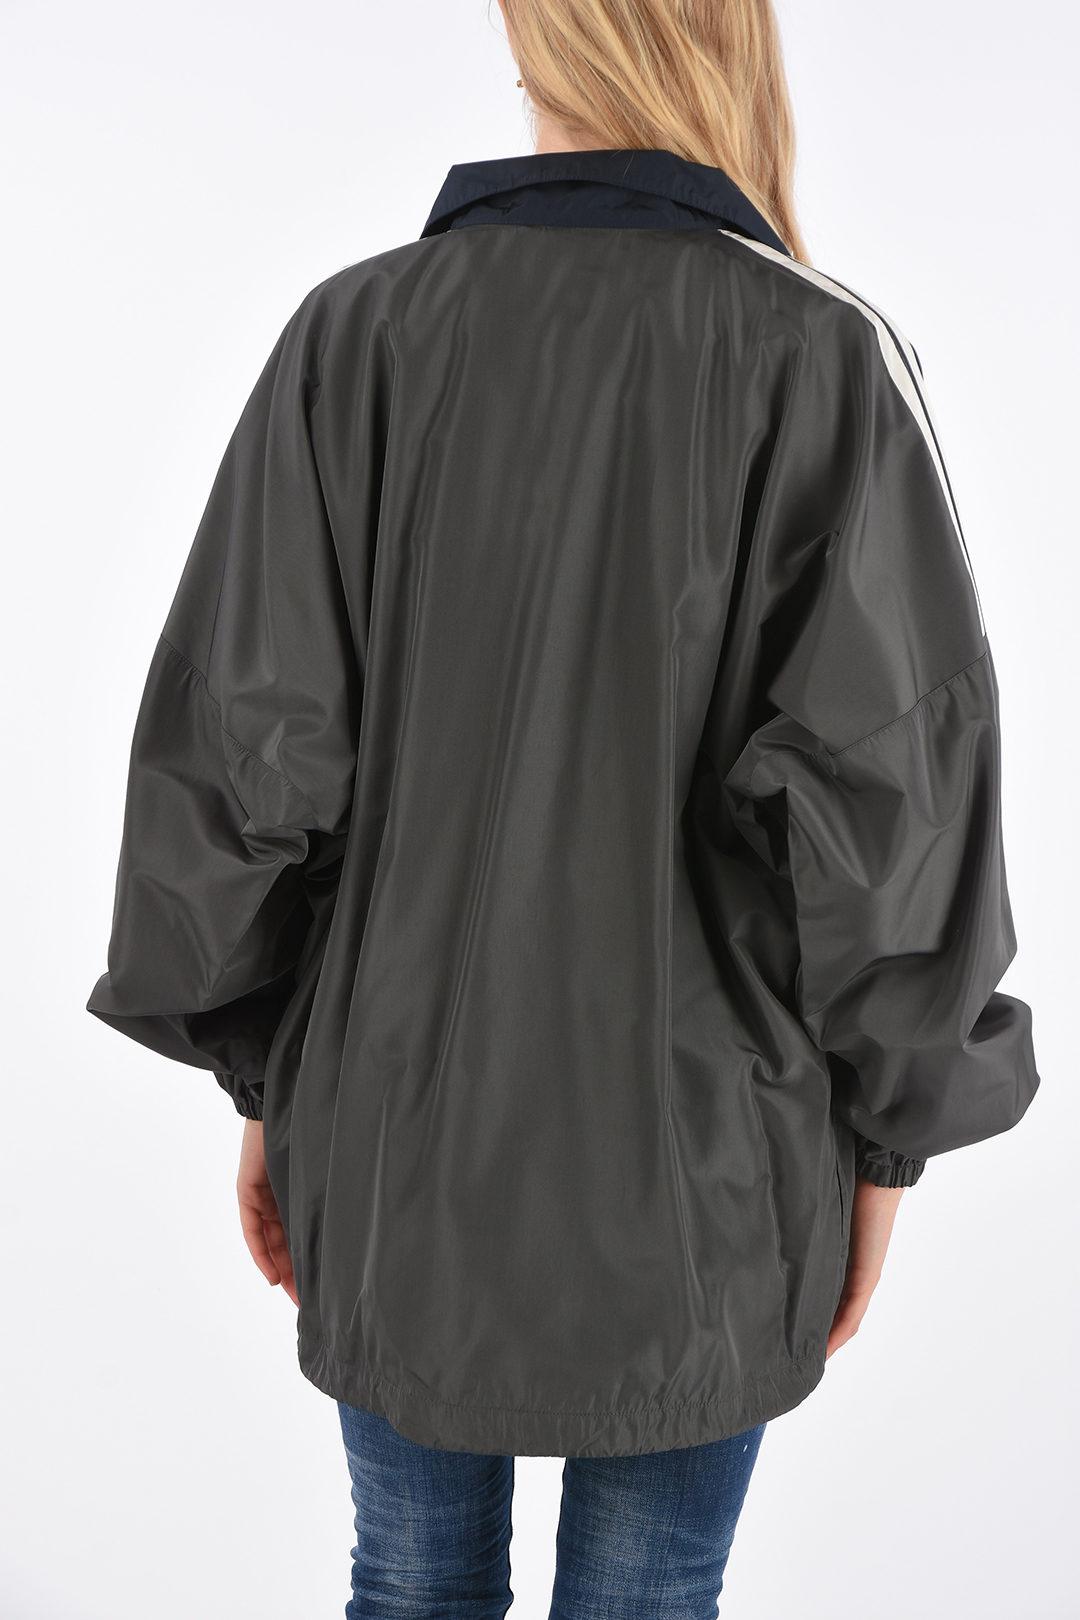 Details about  /FRESH PRODUCE XL 98$ Lagoon Green Priya Cotton Stretch Bomber Zip Jacket Coat